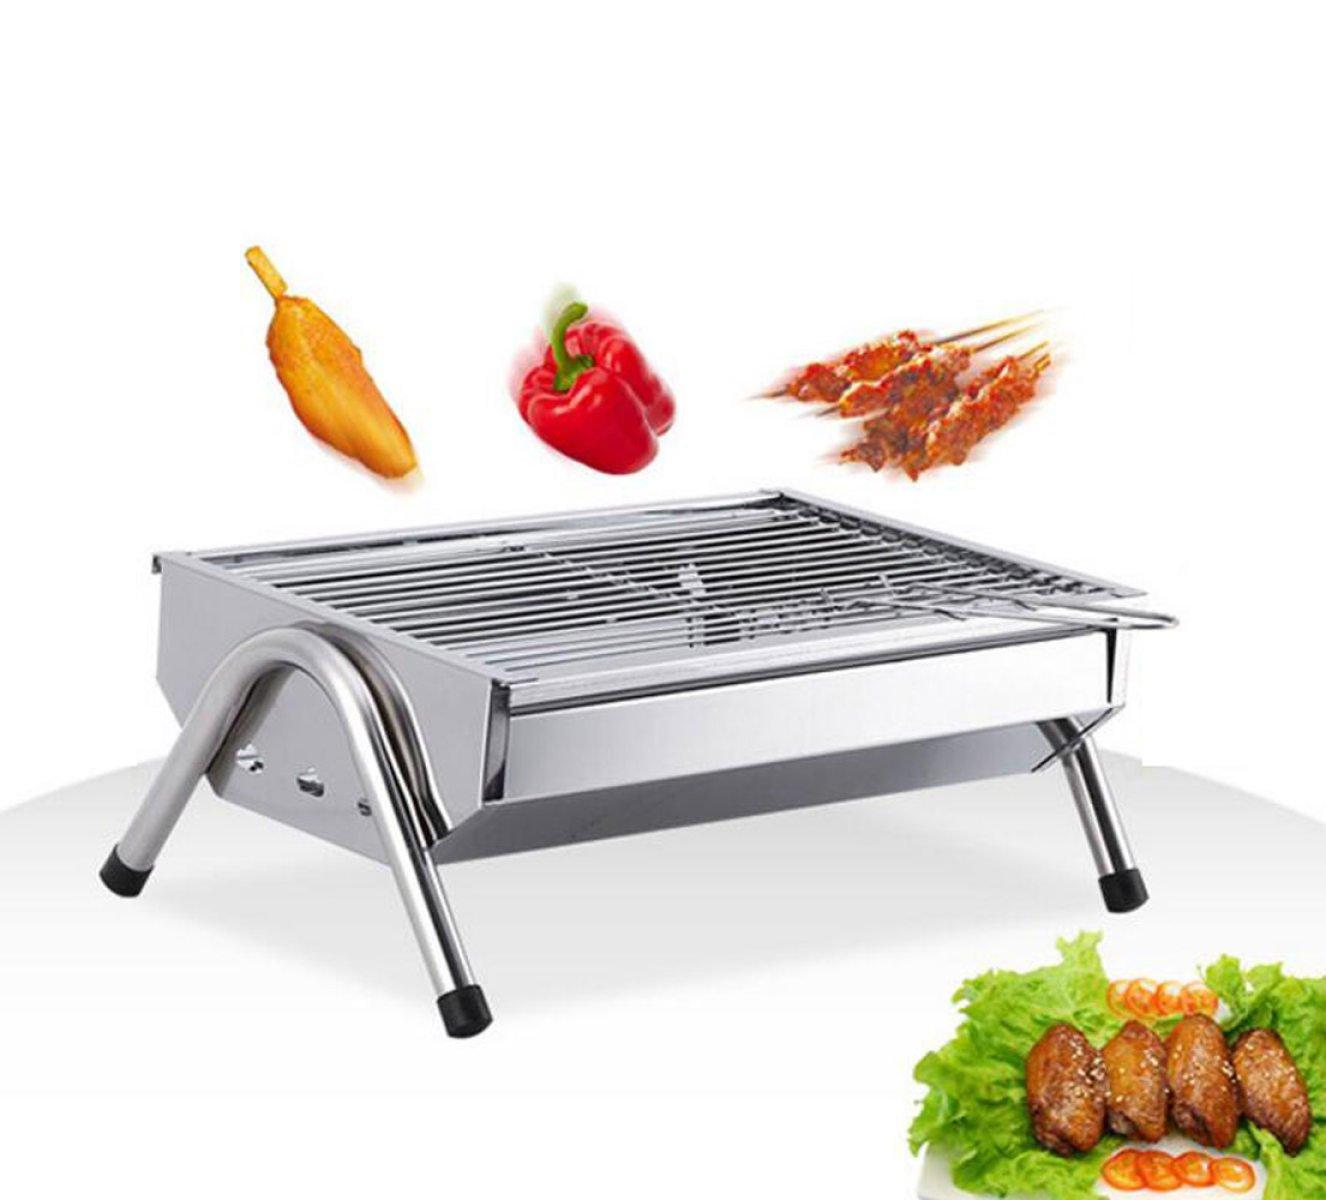 Massives Edelstahl Tragbare Kohlegrill Im Freien Grill Hause Grill-Box